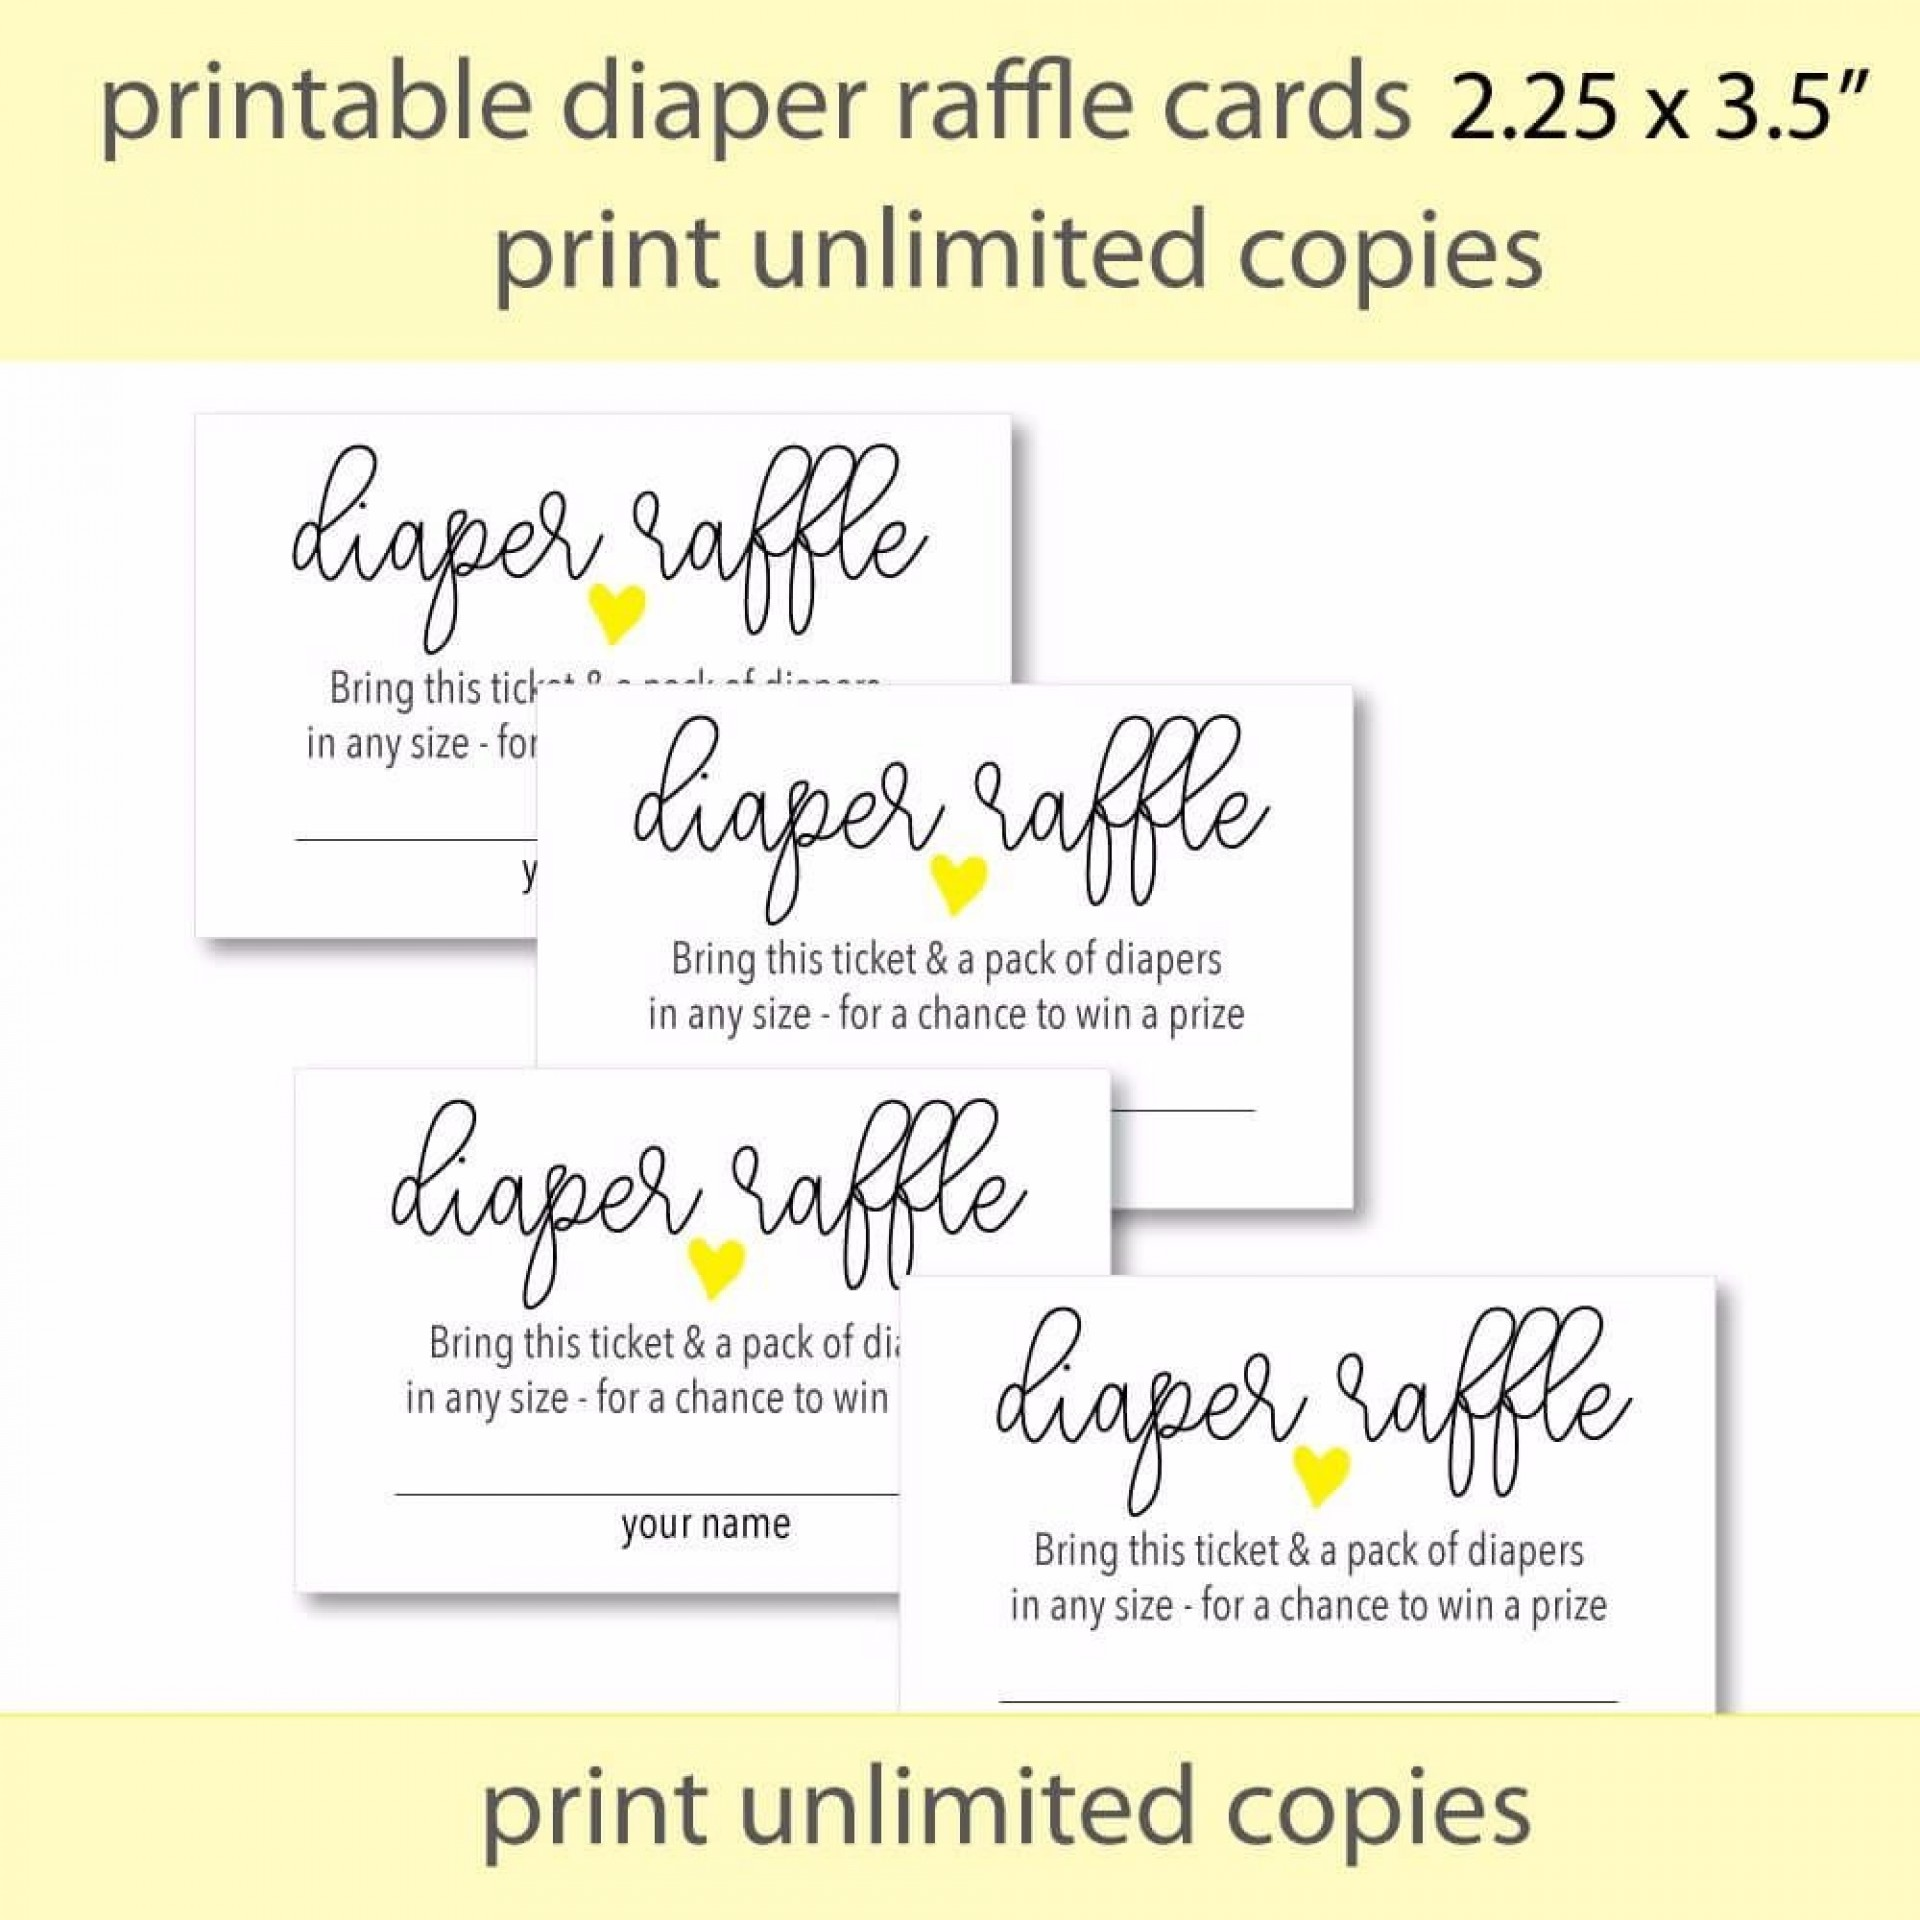 008 Amazing Diaper Raffle Ticket Template Design  Boy Free Printable Print Black And White1920